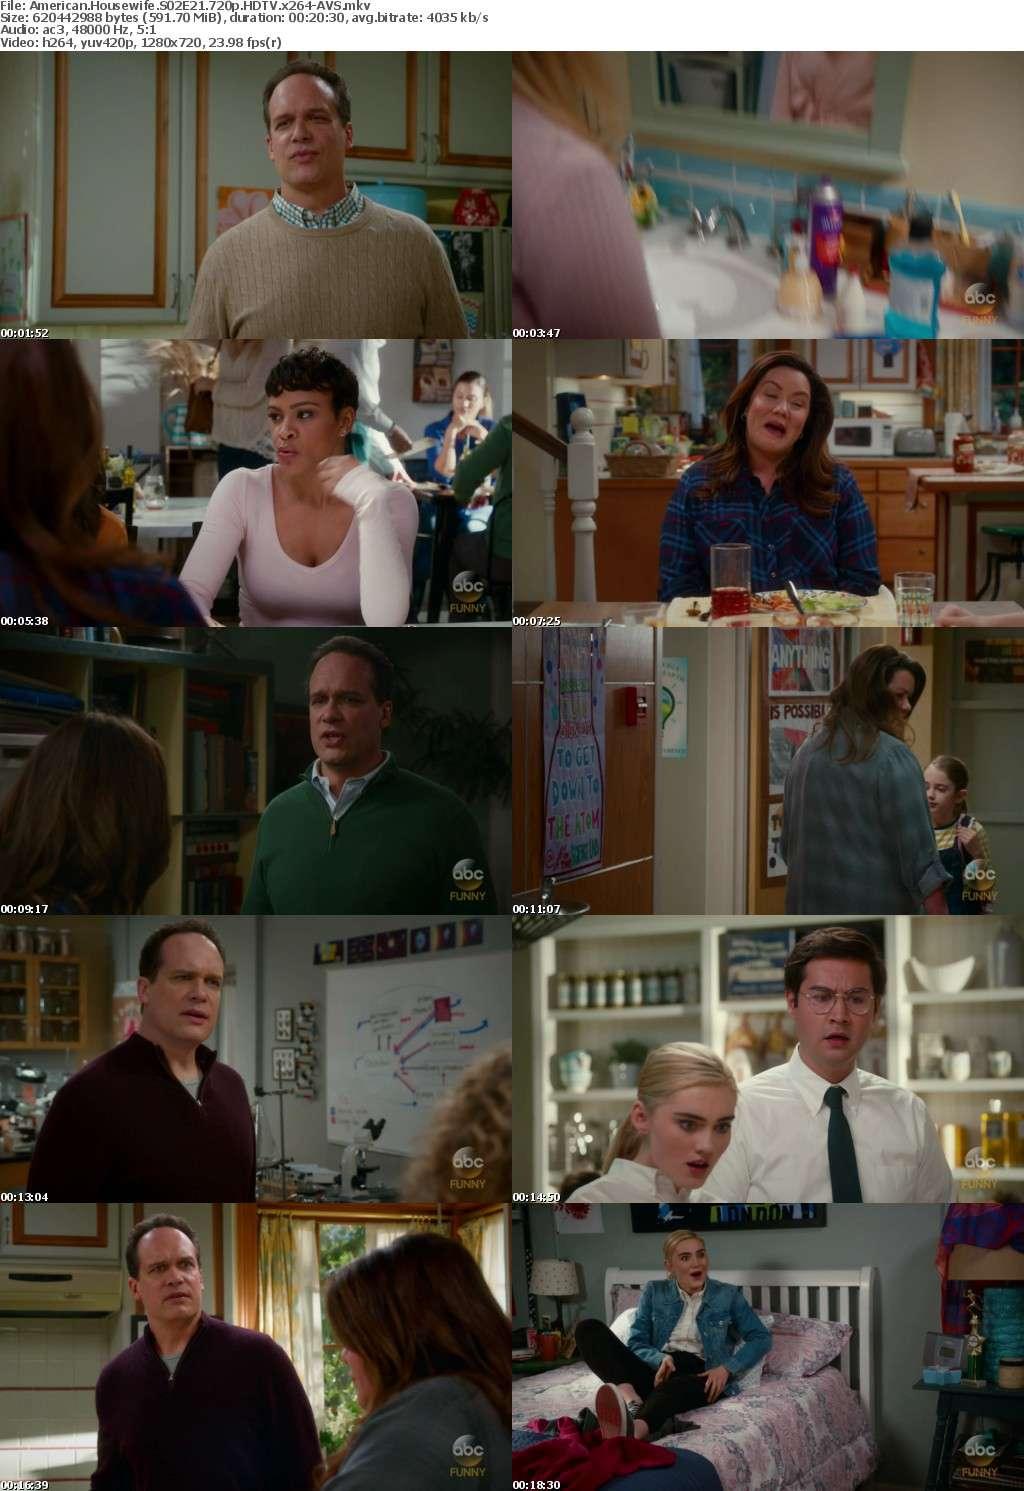 American Housewife S02E21 720p HDTV x264-AVS